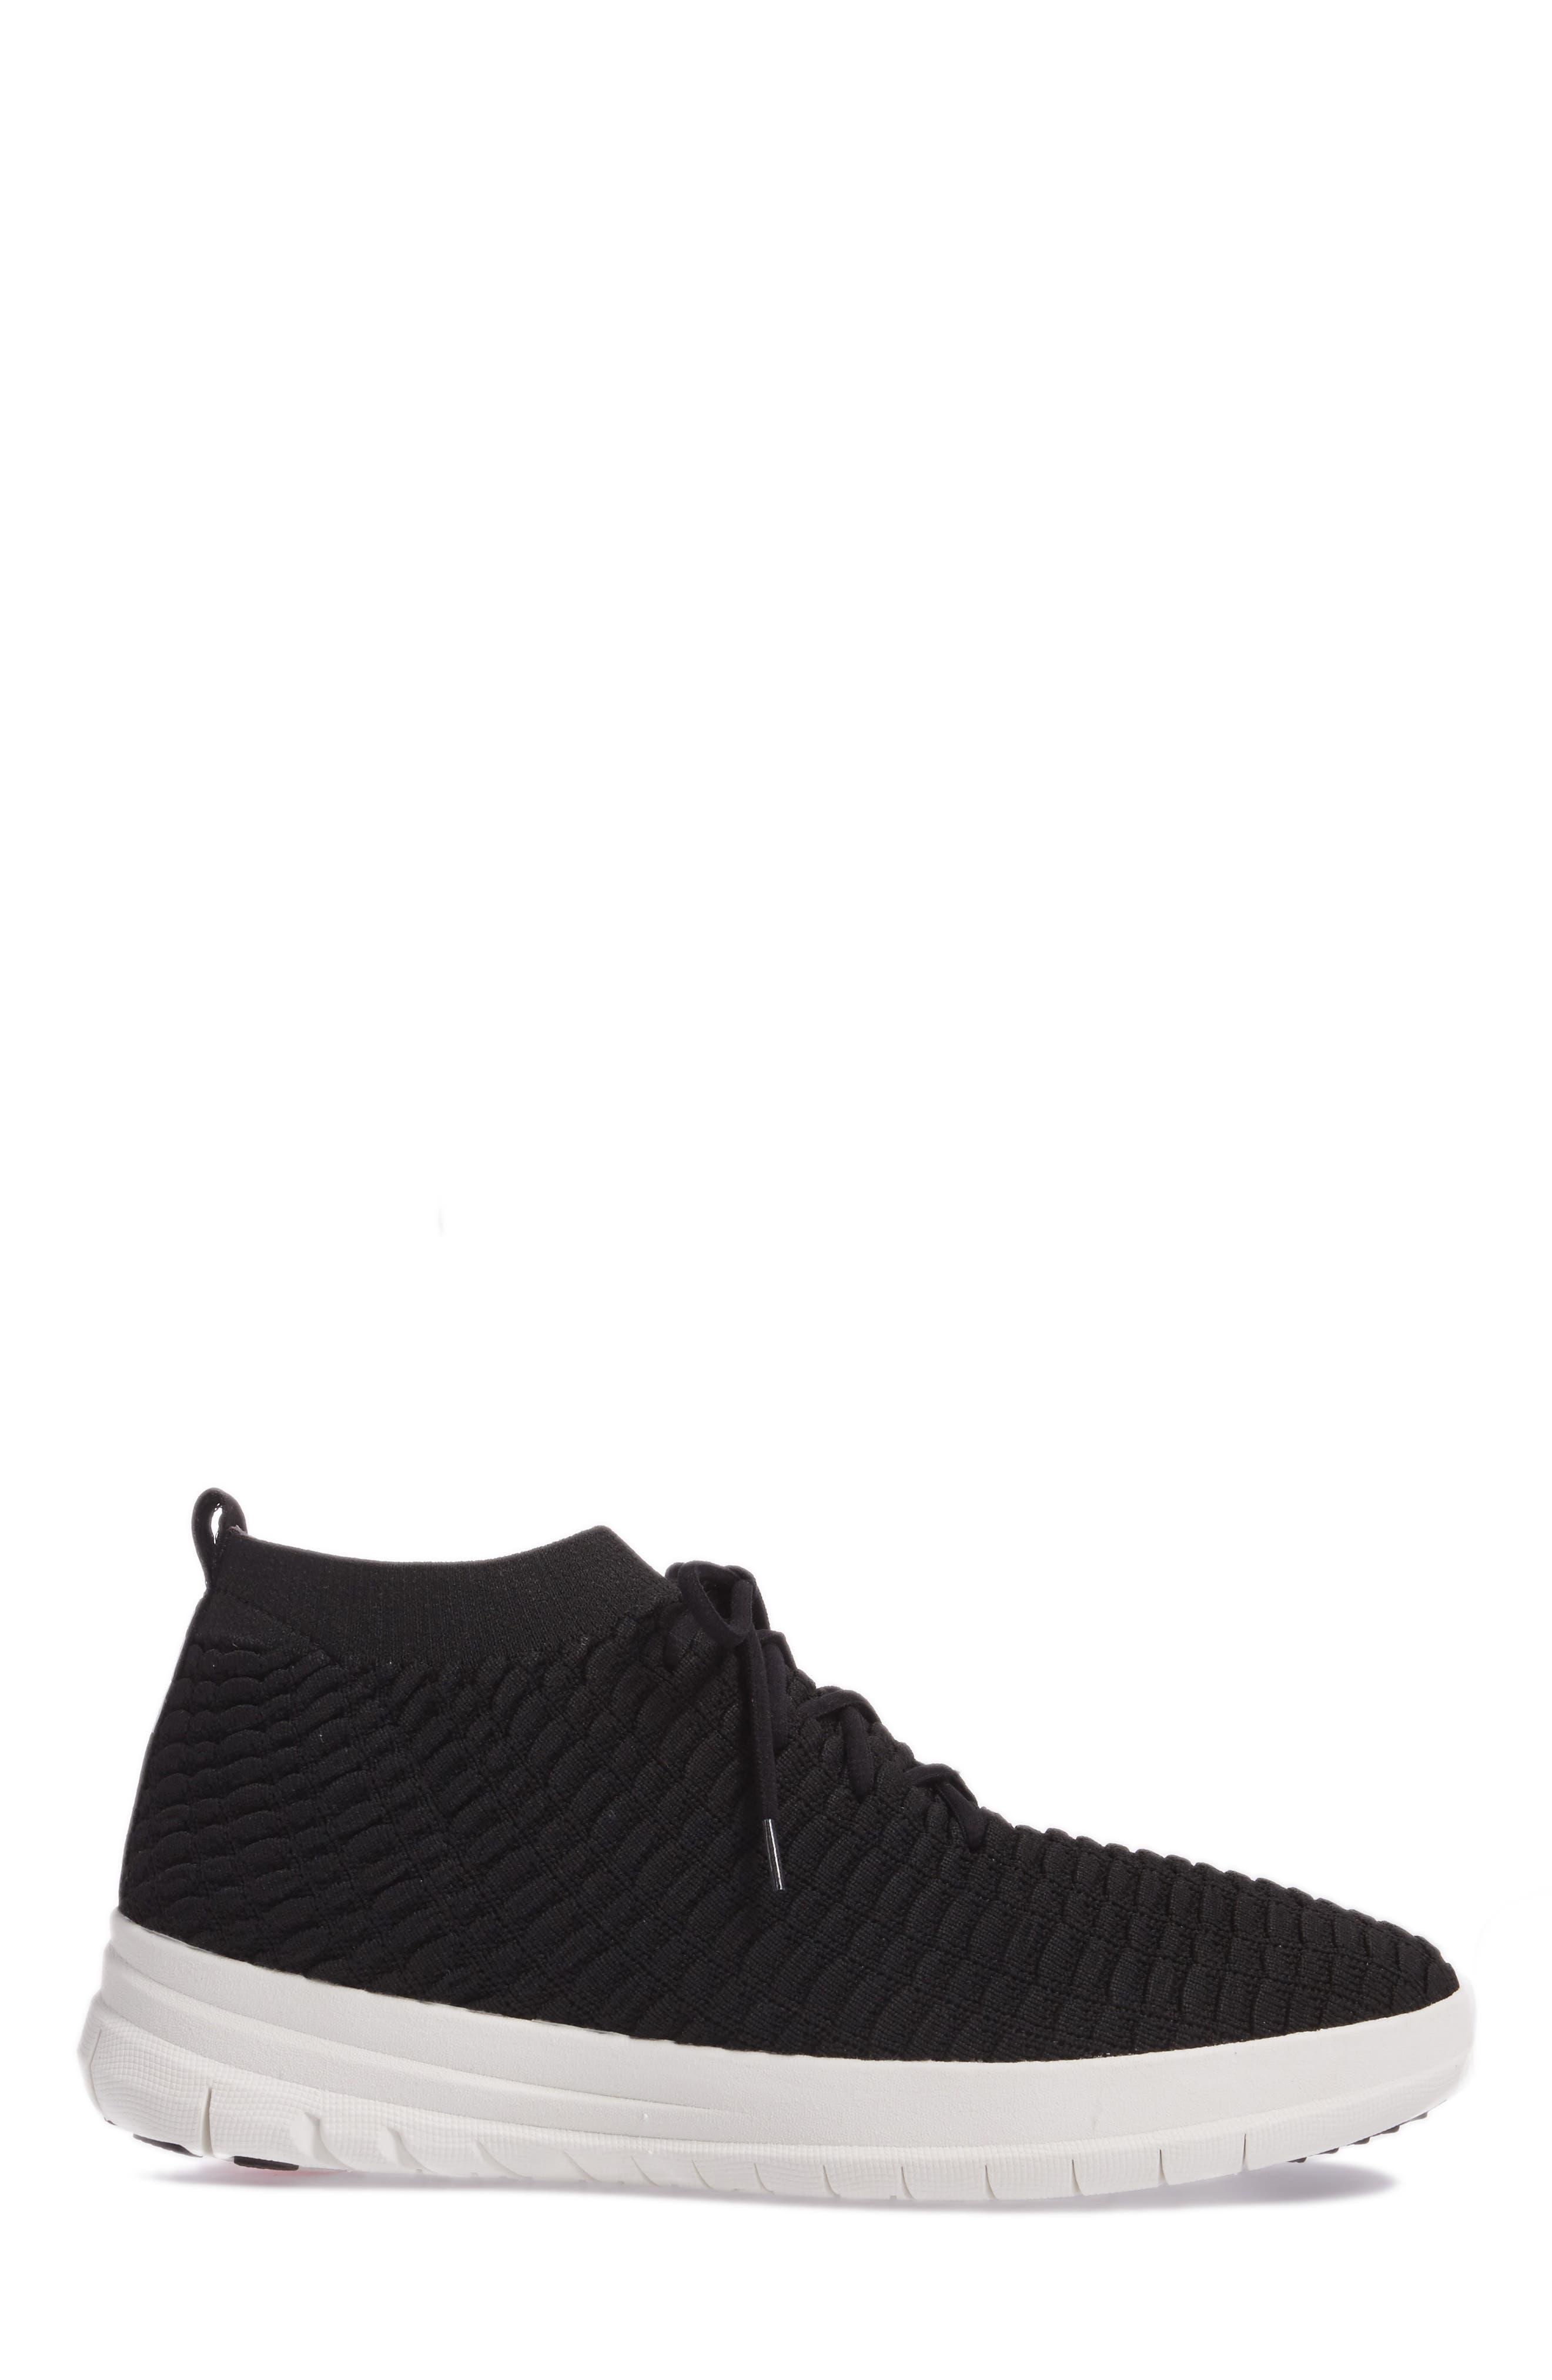 Uberknit Sneaker,                             Alternate thumbnail 3, color,                             Black Textile